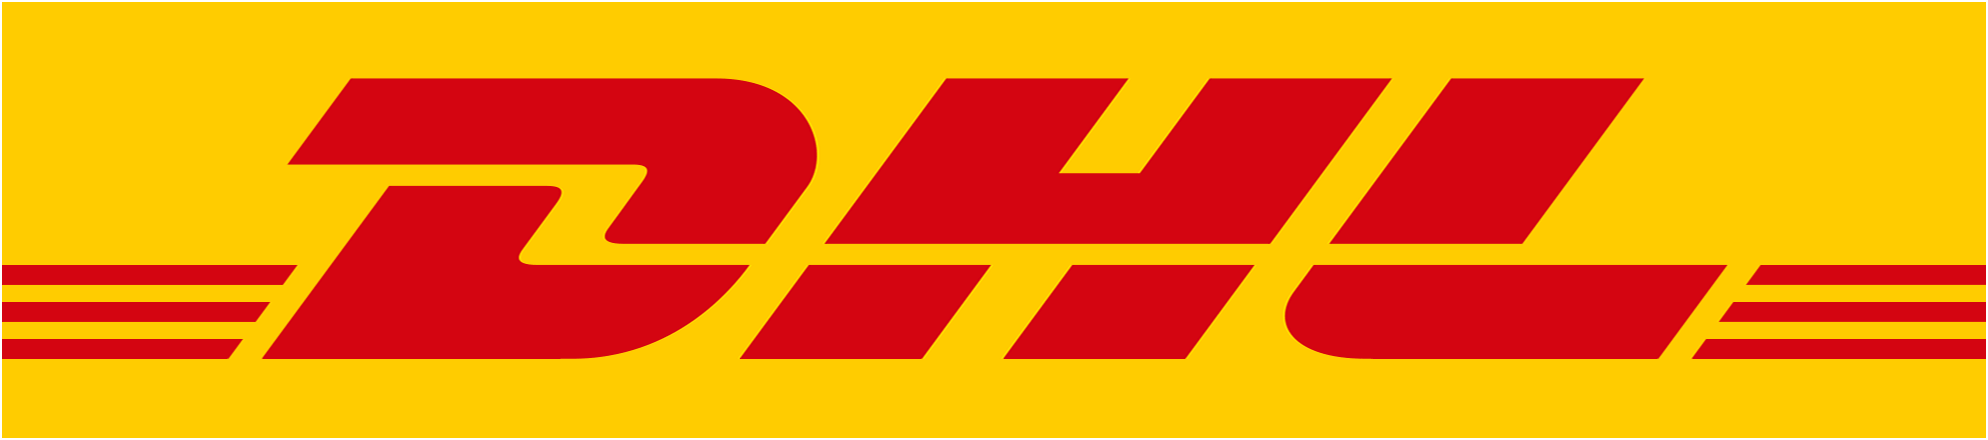 DHL24 Shipping Export Plugin